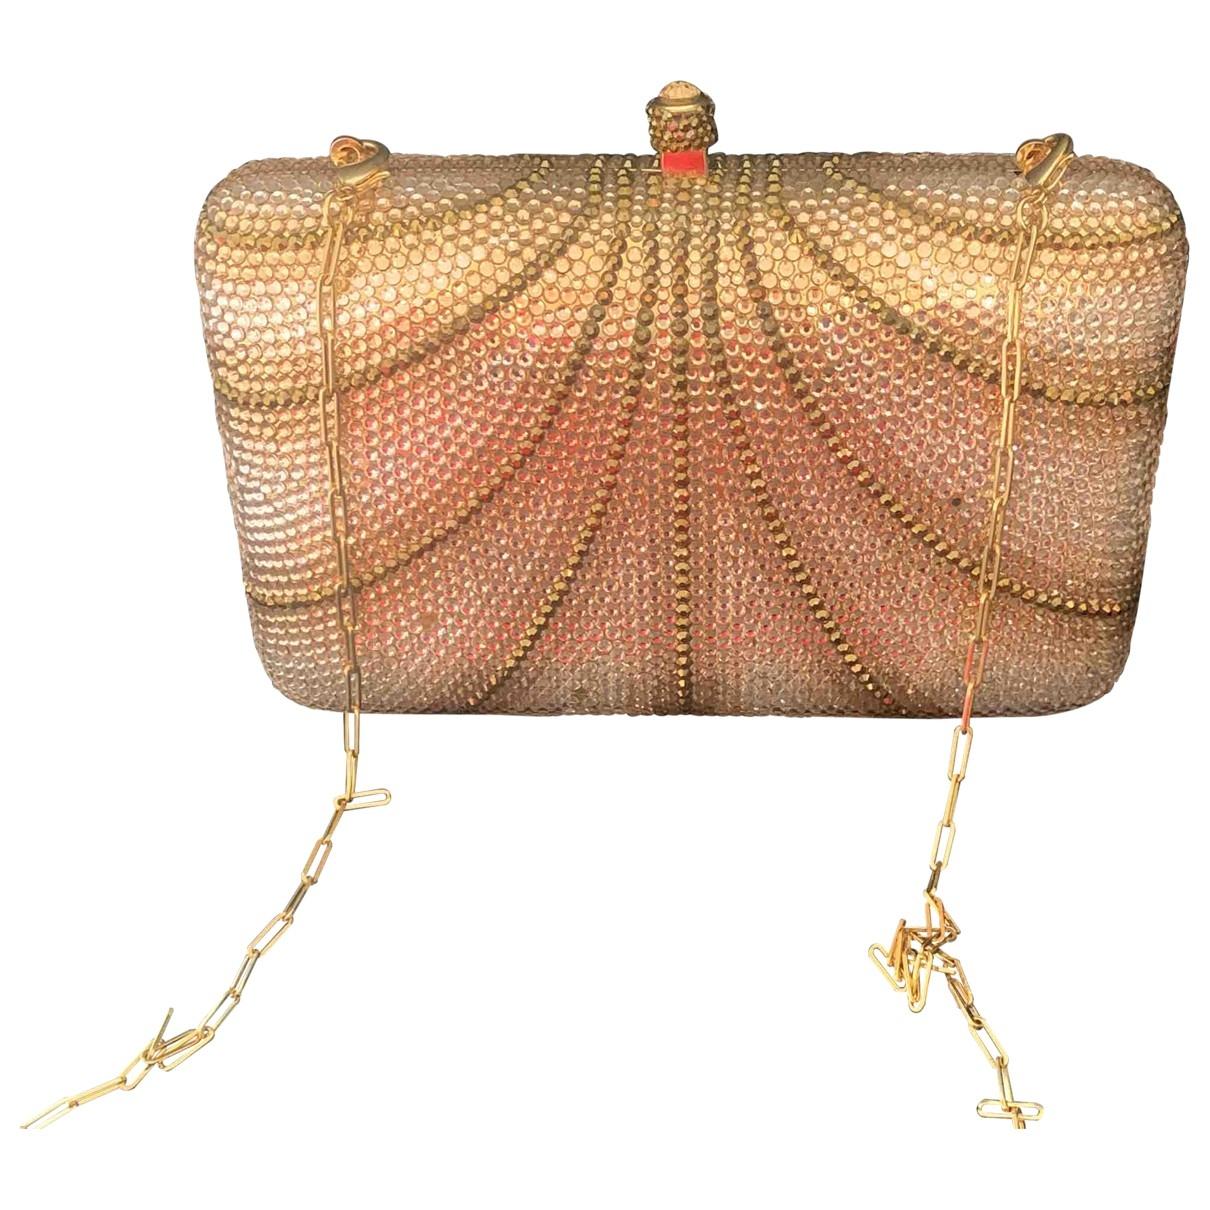 Azzaro \N Gold Metal Clutch bag for Women \N